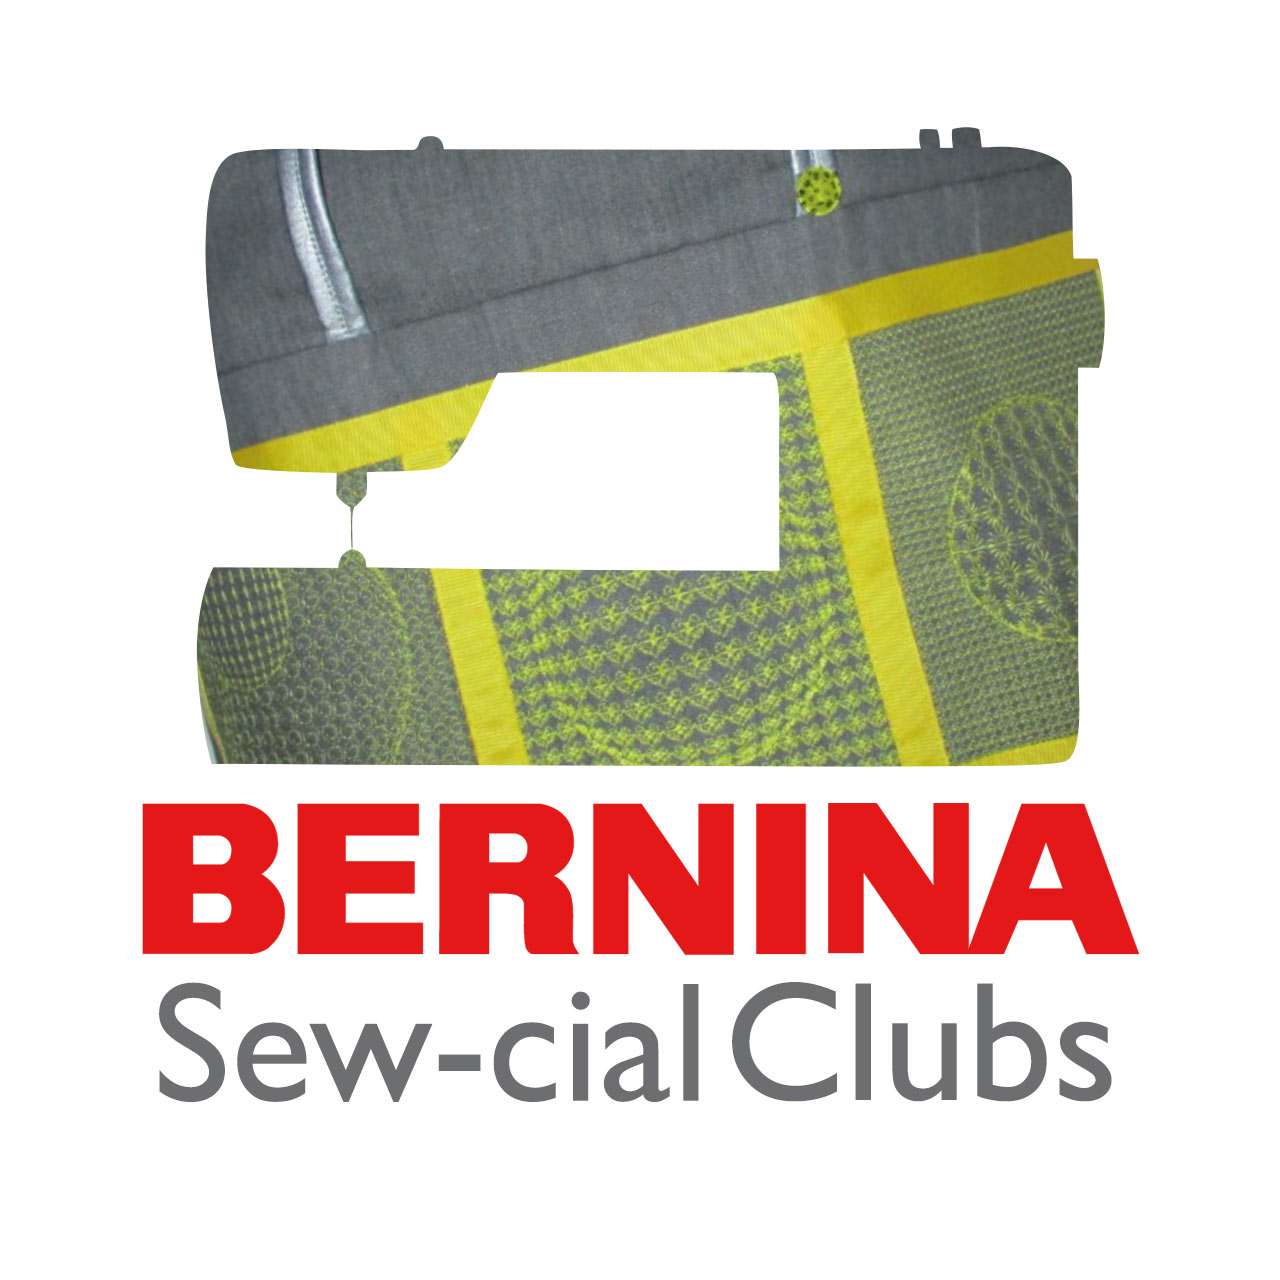 Sew-cial Club descriptions for Septmber 2017